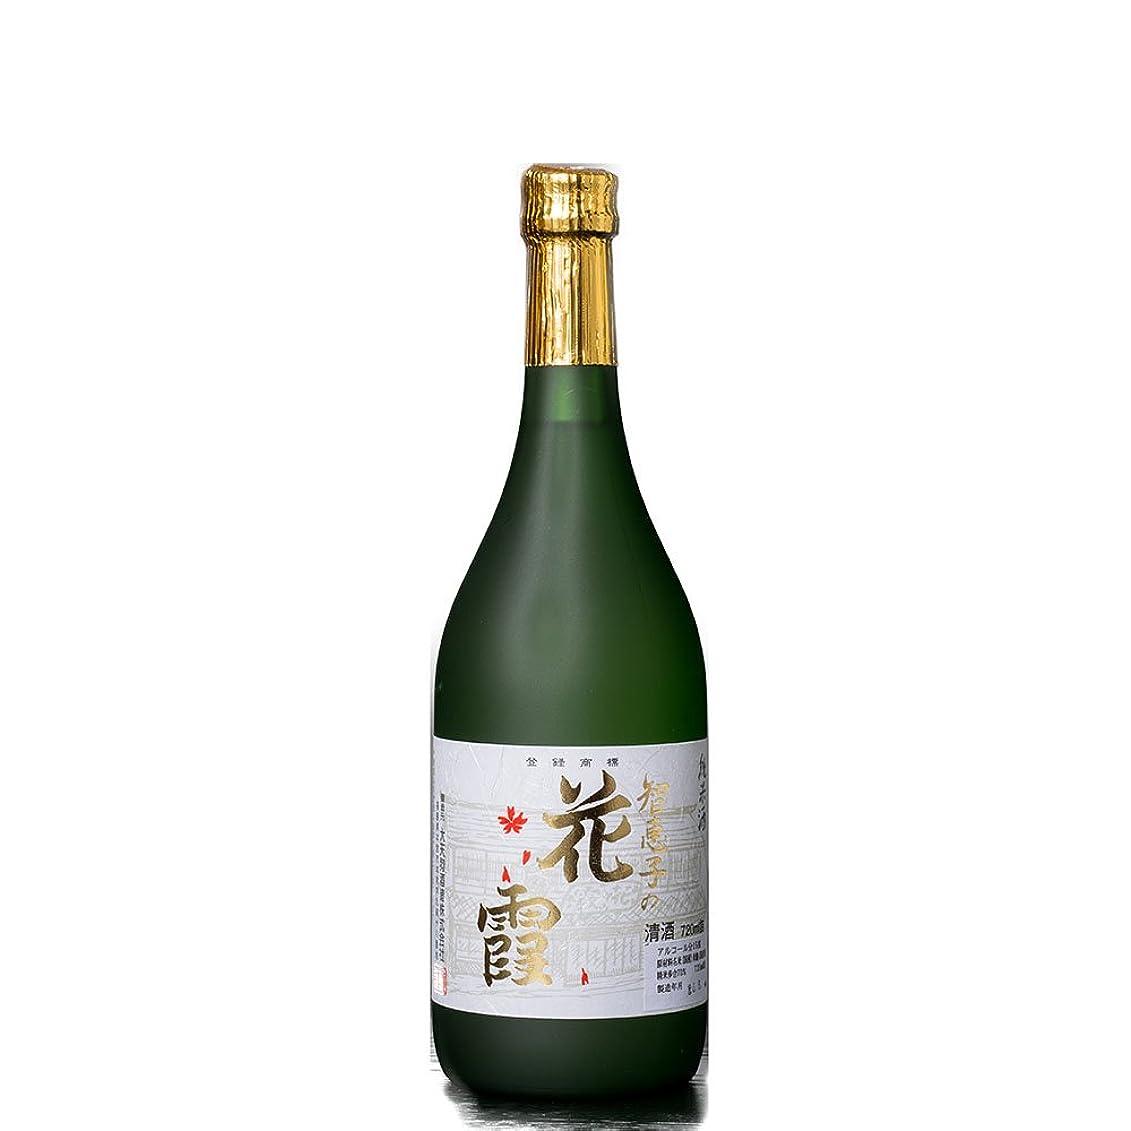 ベット痴漢東部智恵子の花霞 純米酒 [ 日本酒 福島県 720ml ]